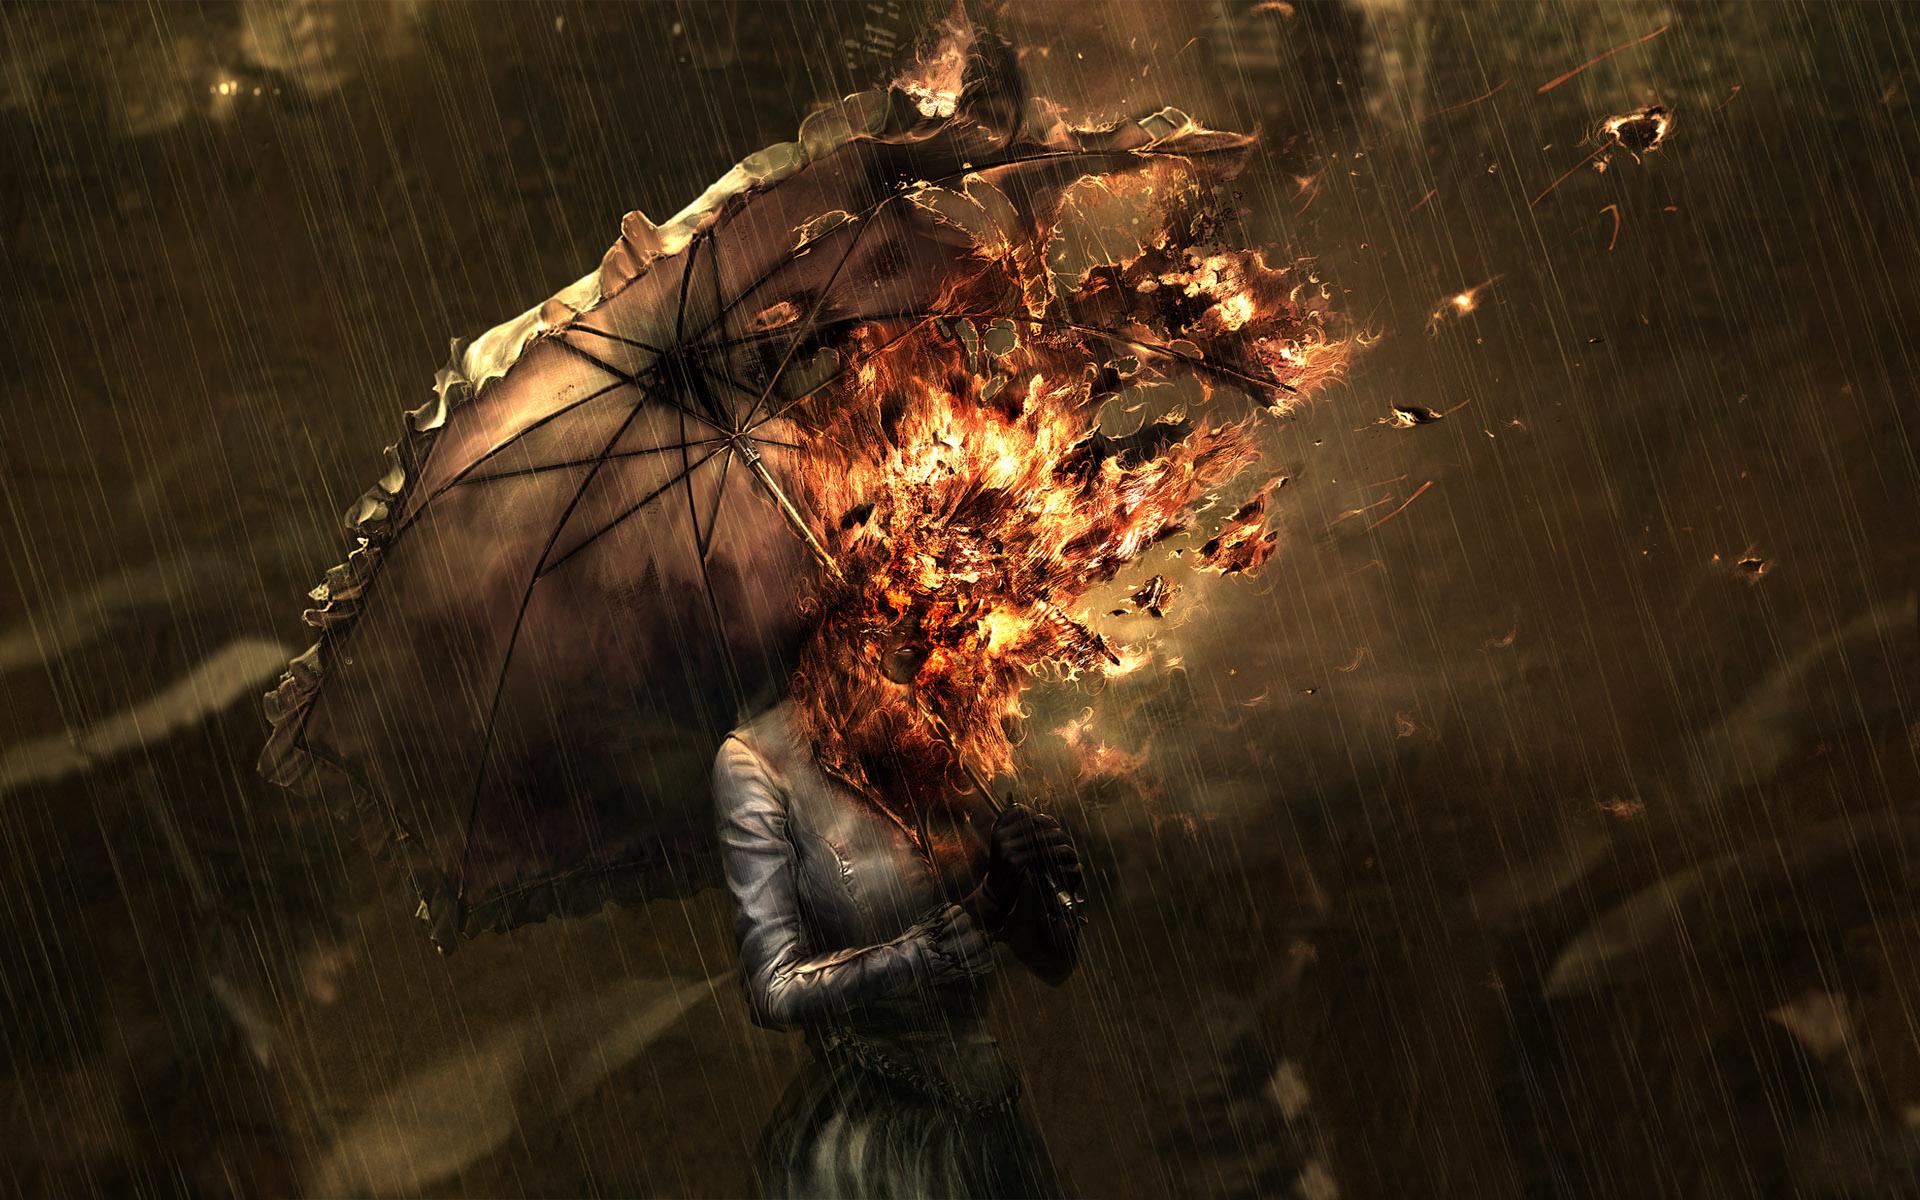 Wallpaper Drawing Women Anime Rain Umbrella Fire Demon Mythology Darkness Screenshot 1920x1200 Px Computer Wallpaper Special Effects Pc Game Adventurer Cg Artwork Visual Effects 1920x1200 Wallhaven 799120 Hd Wallpapers Wallhere